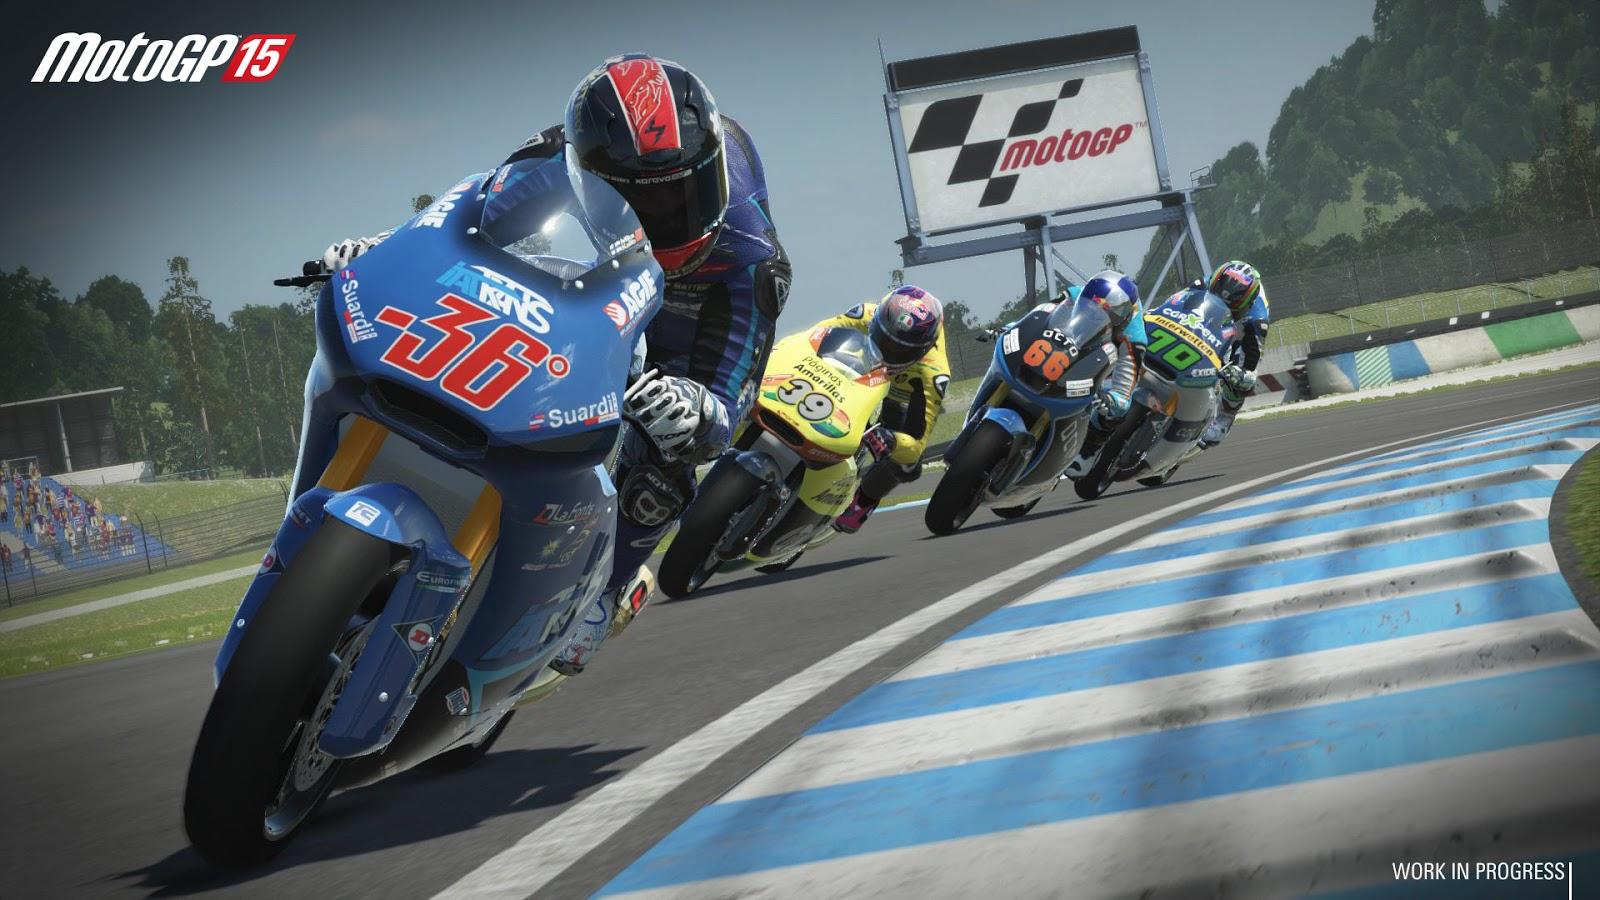 MotoGP 15 PS3 XBOX360 free download full version ~ MEGA CONSOLE GAMES